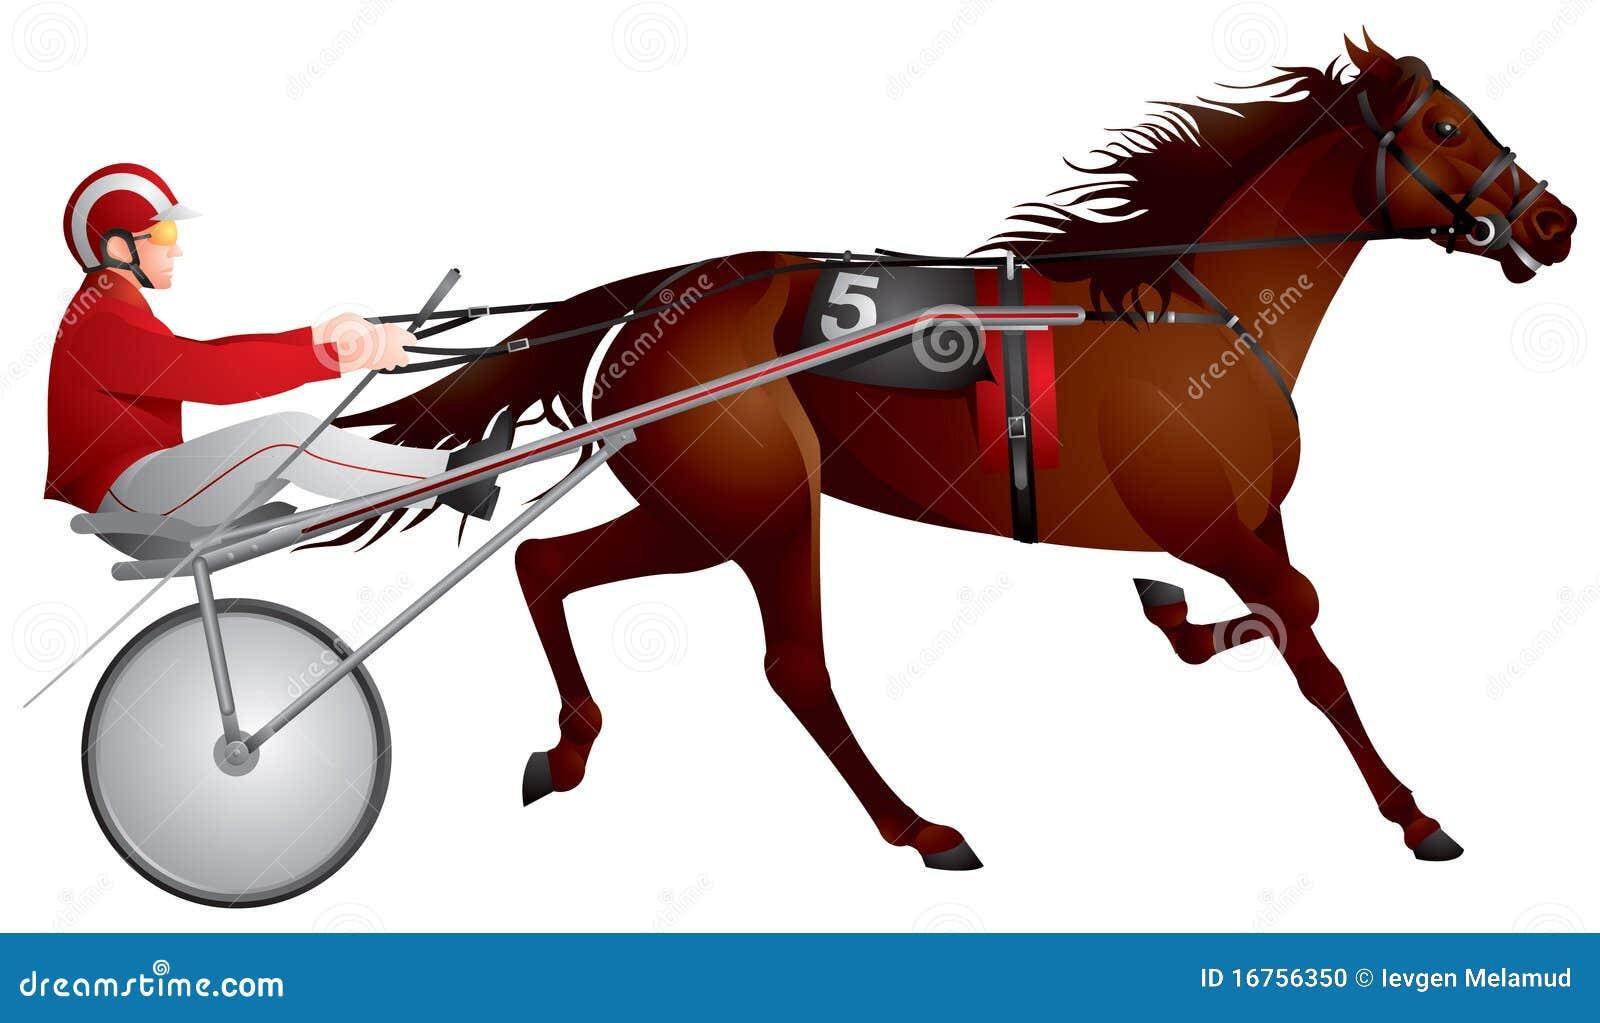 Harness racing, horse, race